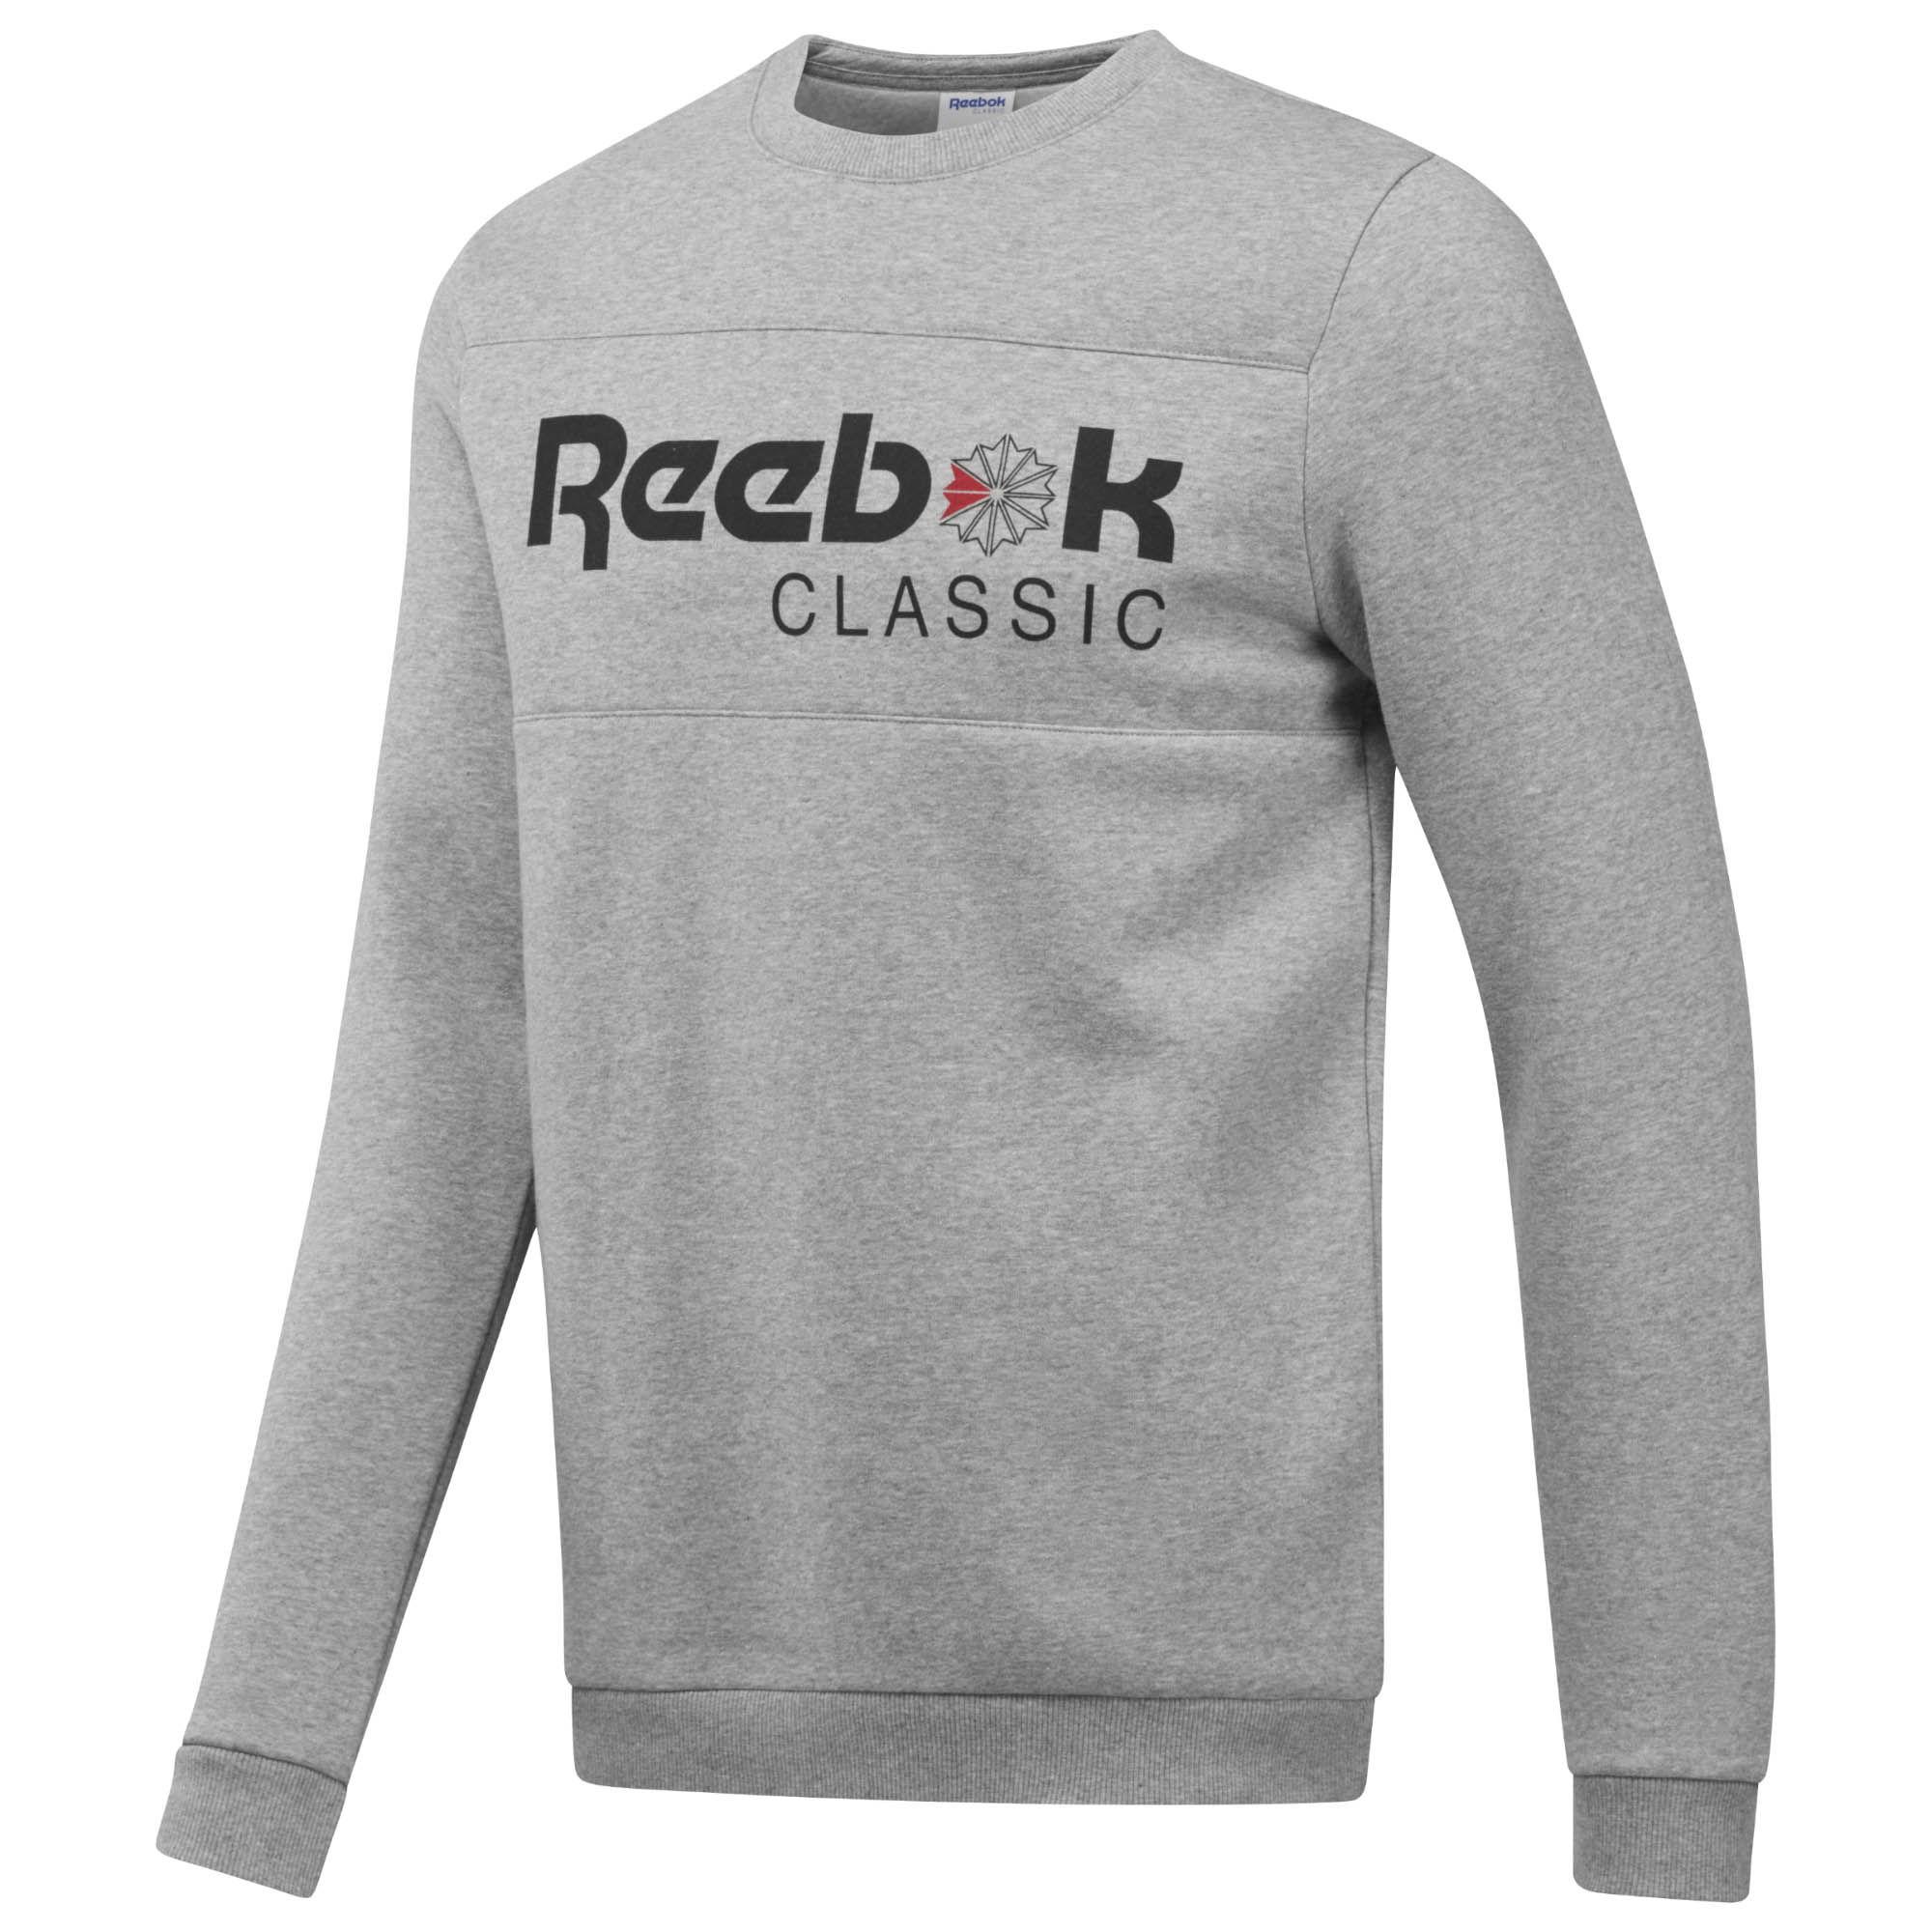 Reebok Reebok Classic Iconic Iconic Reebok Crewneck Classic Fleece Fleece Classic Crewneck dCxQoWrBEe